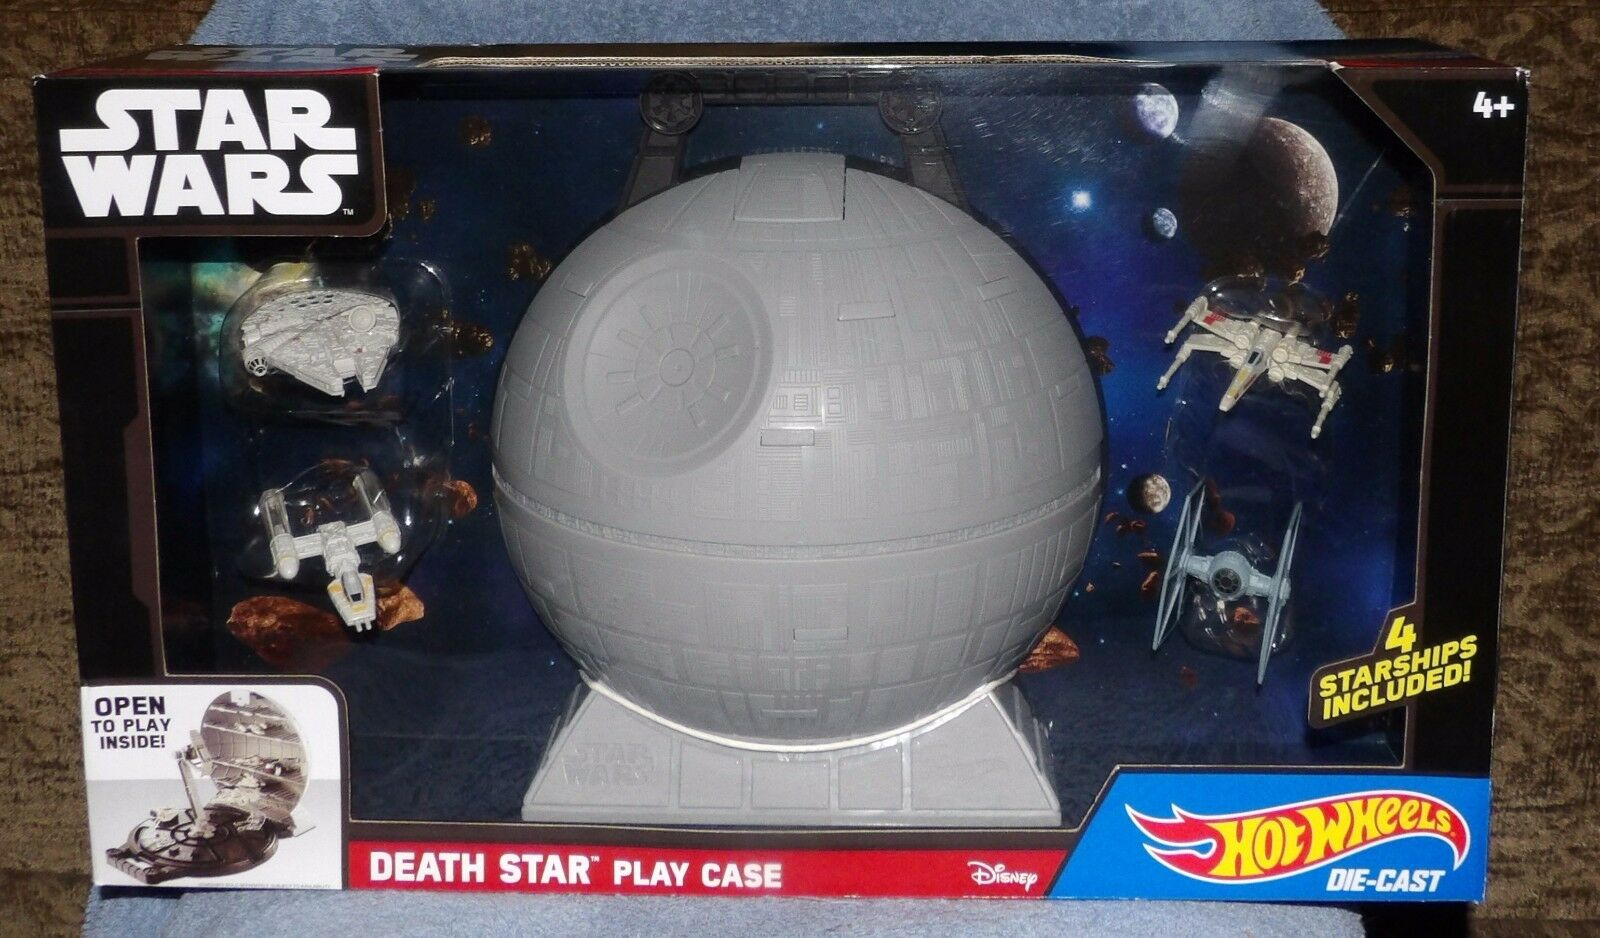 HOT WHEELS STAR WARS DEATH STAR PLAY VASE WITH 4 STARSHIPS DIE-CAST